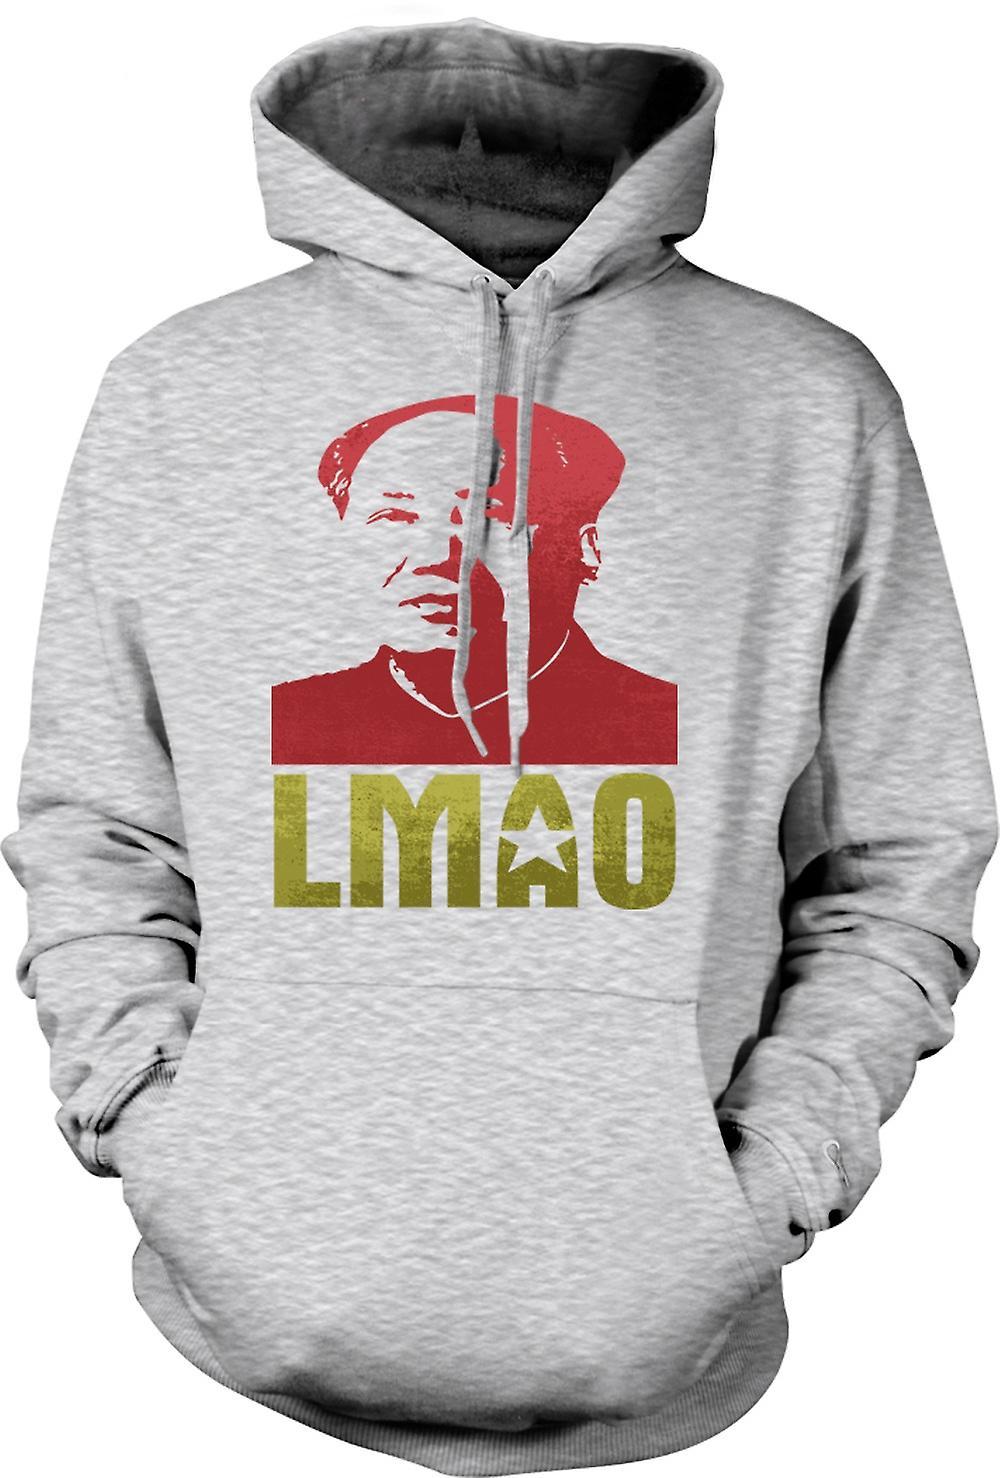 Mens-Hoodie - LMAO Vorsitzenden Mao - lustig